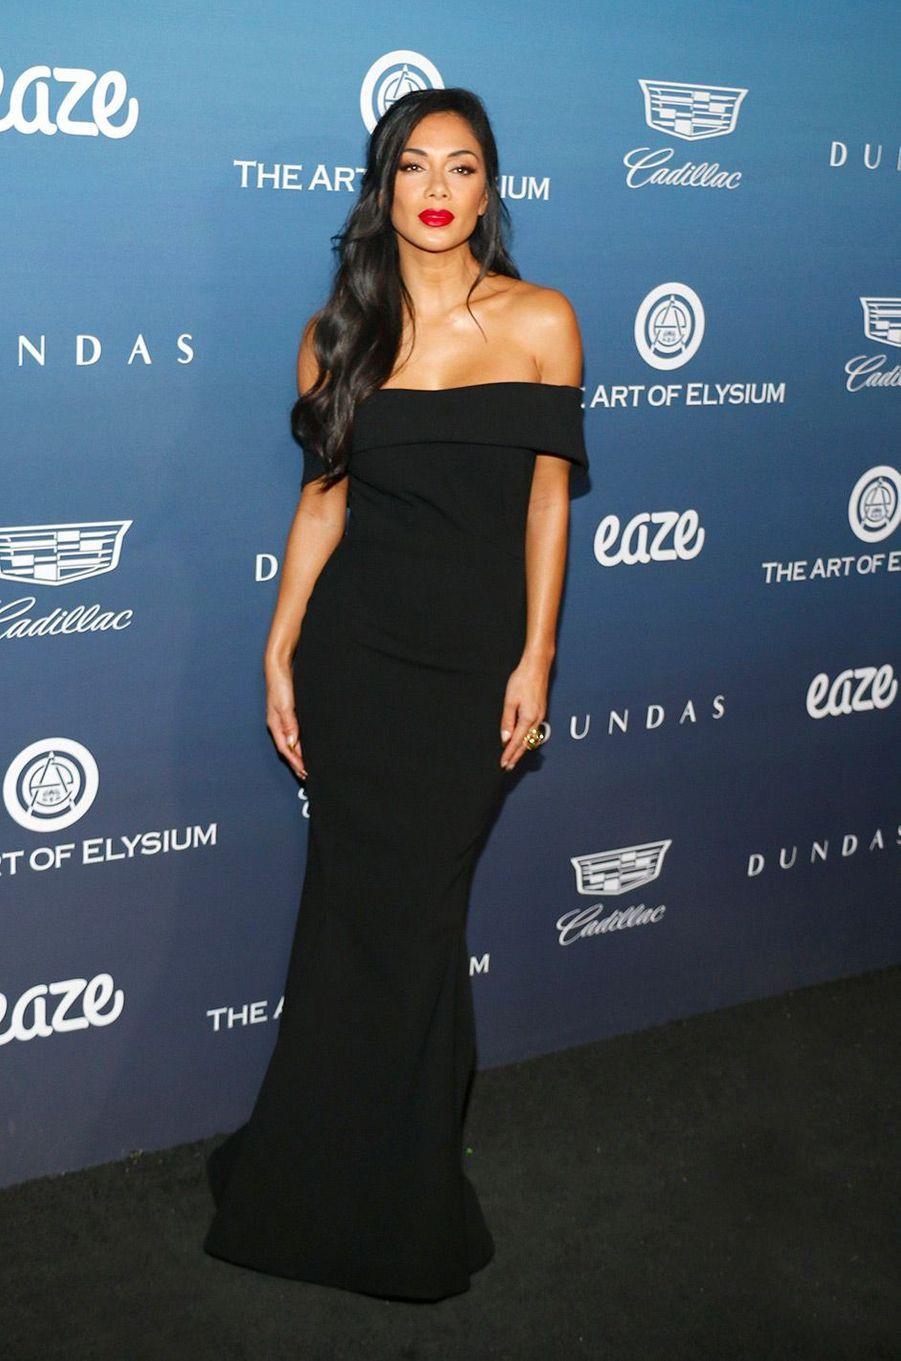 Nicole Scherzinger au gala Art of Elysium, à Los Angeles, samedi 5 janvier